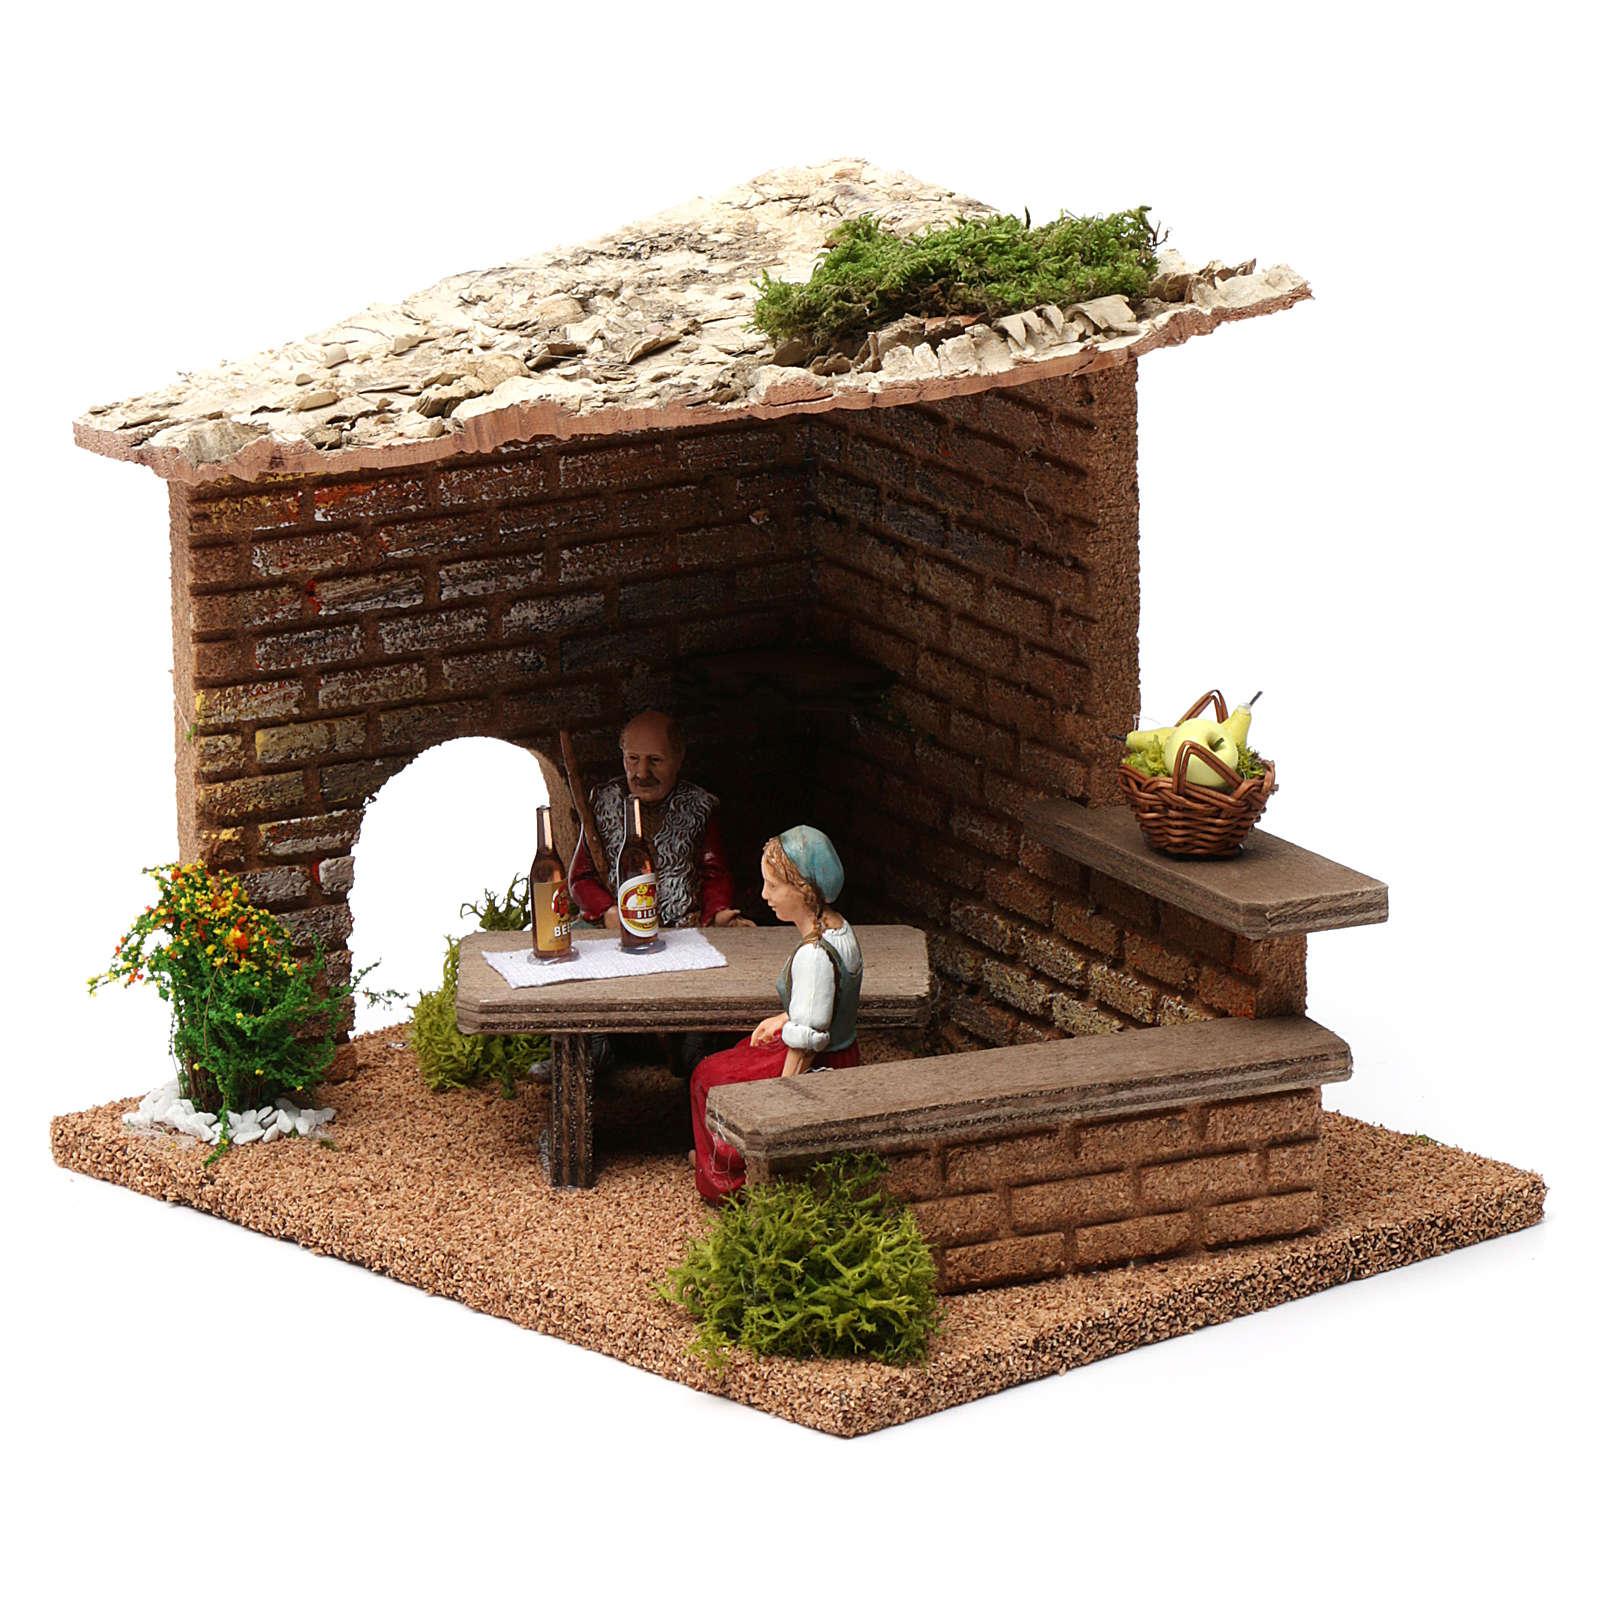 Cellar with farmers 20x20x20 cm for Nativity Scene 9-10 cm 4